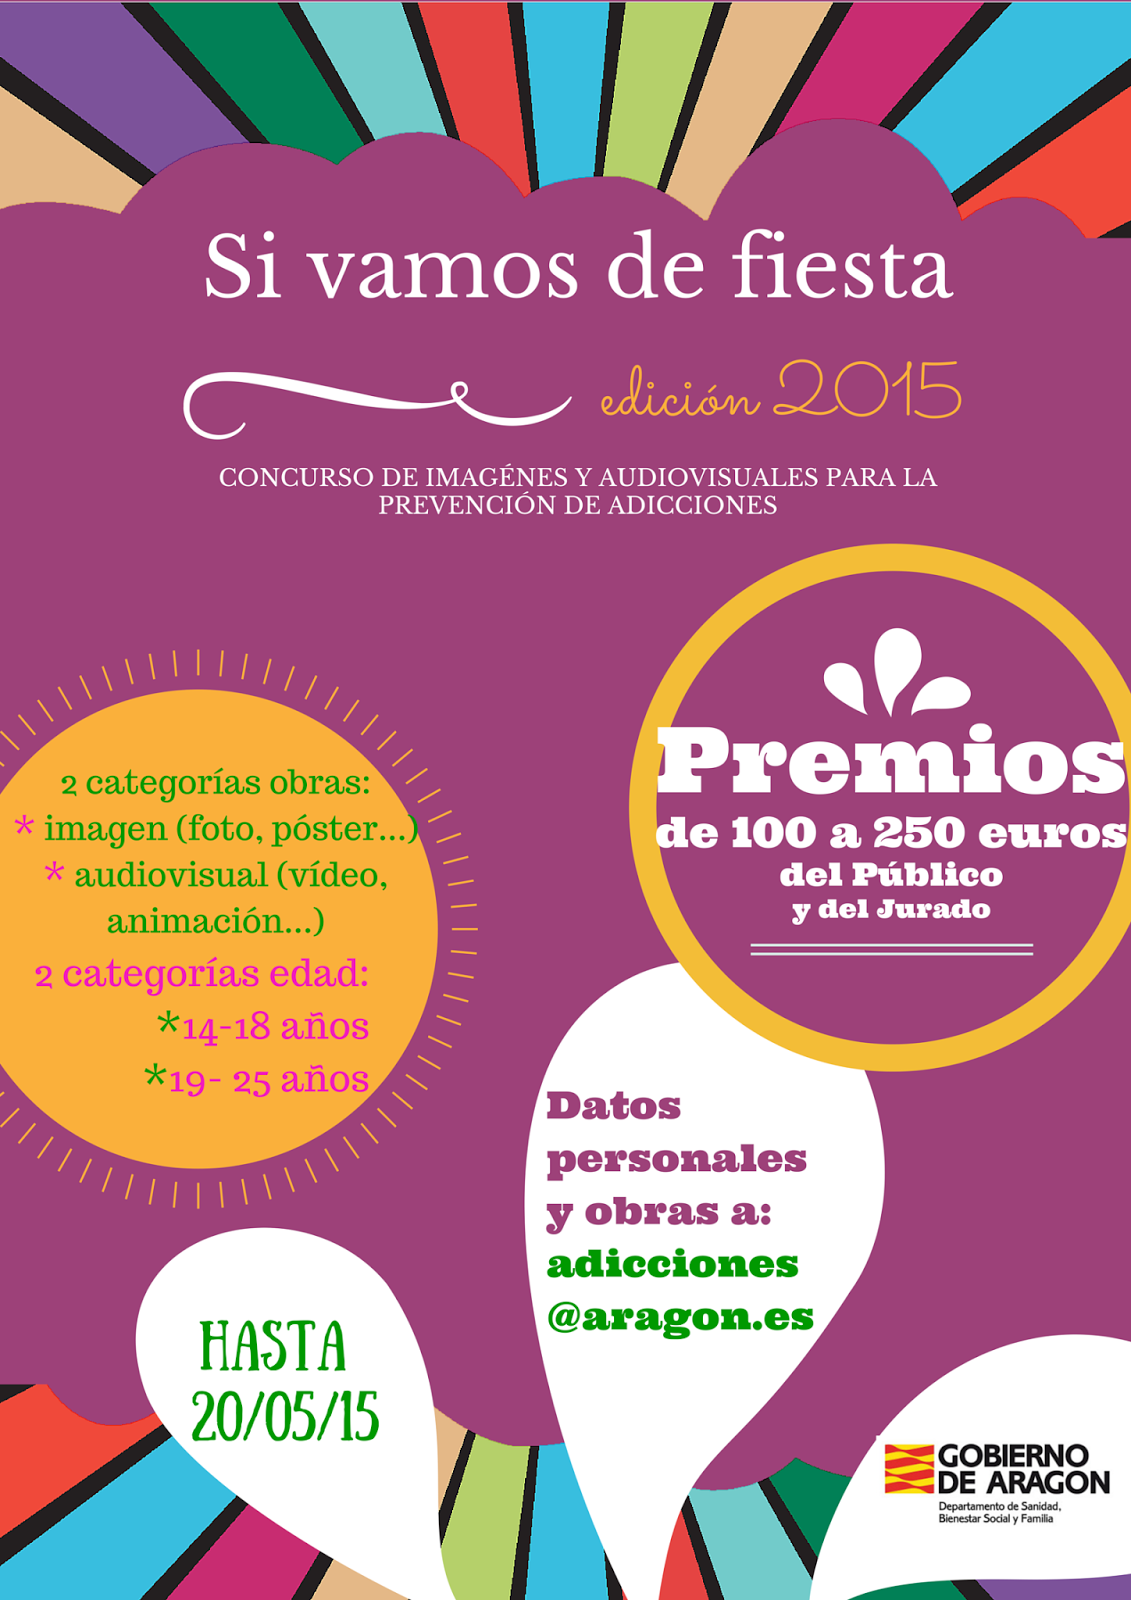 https://www.facebook.com/sivamosdefiesta/app_256593927709045